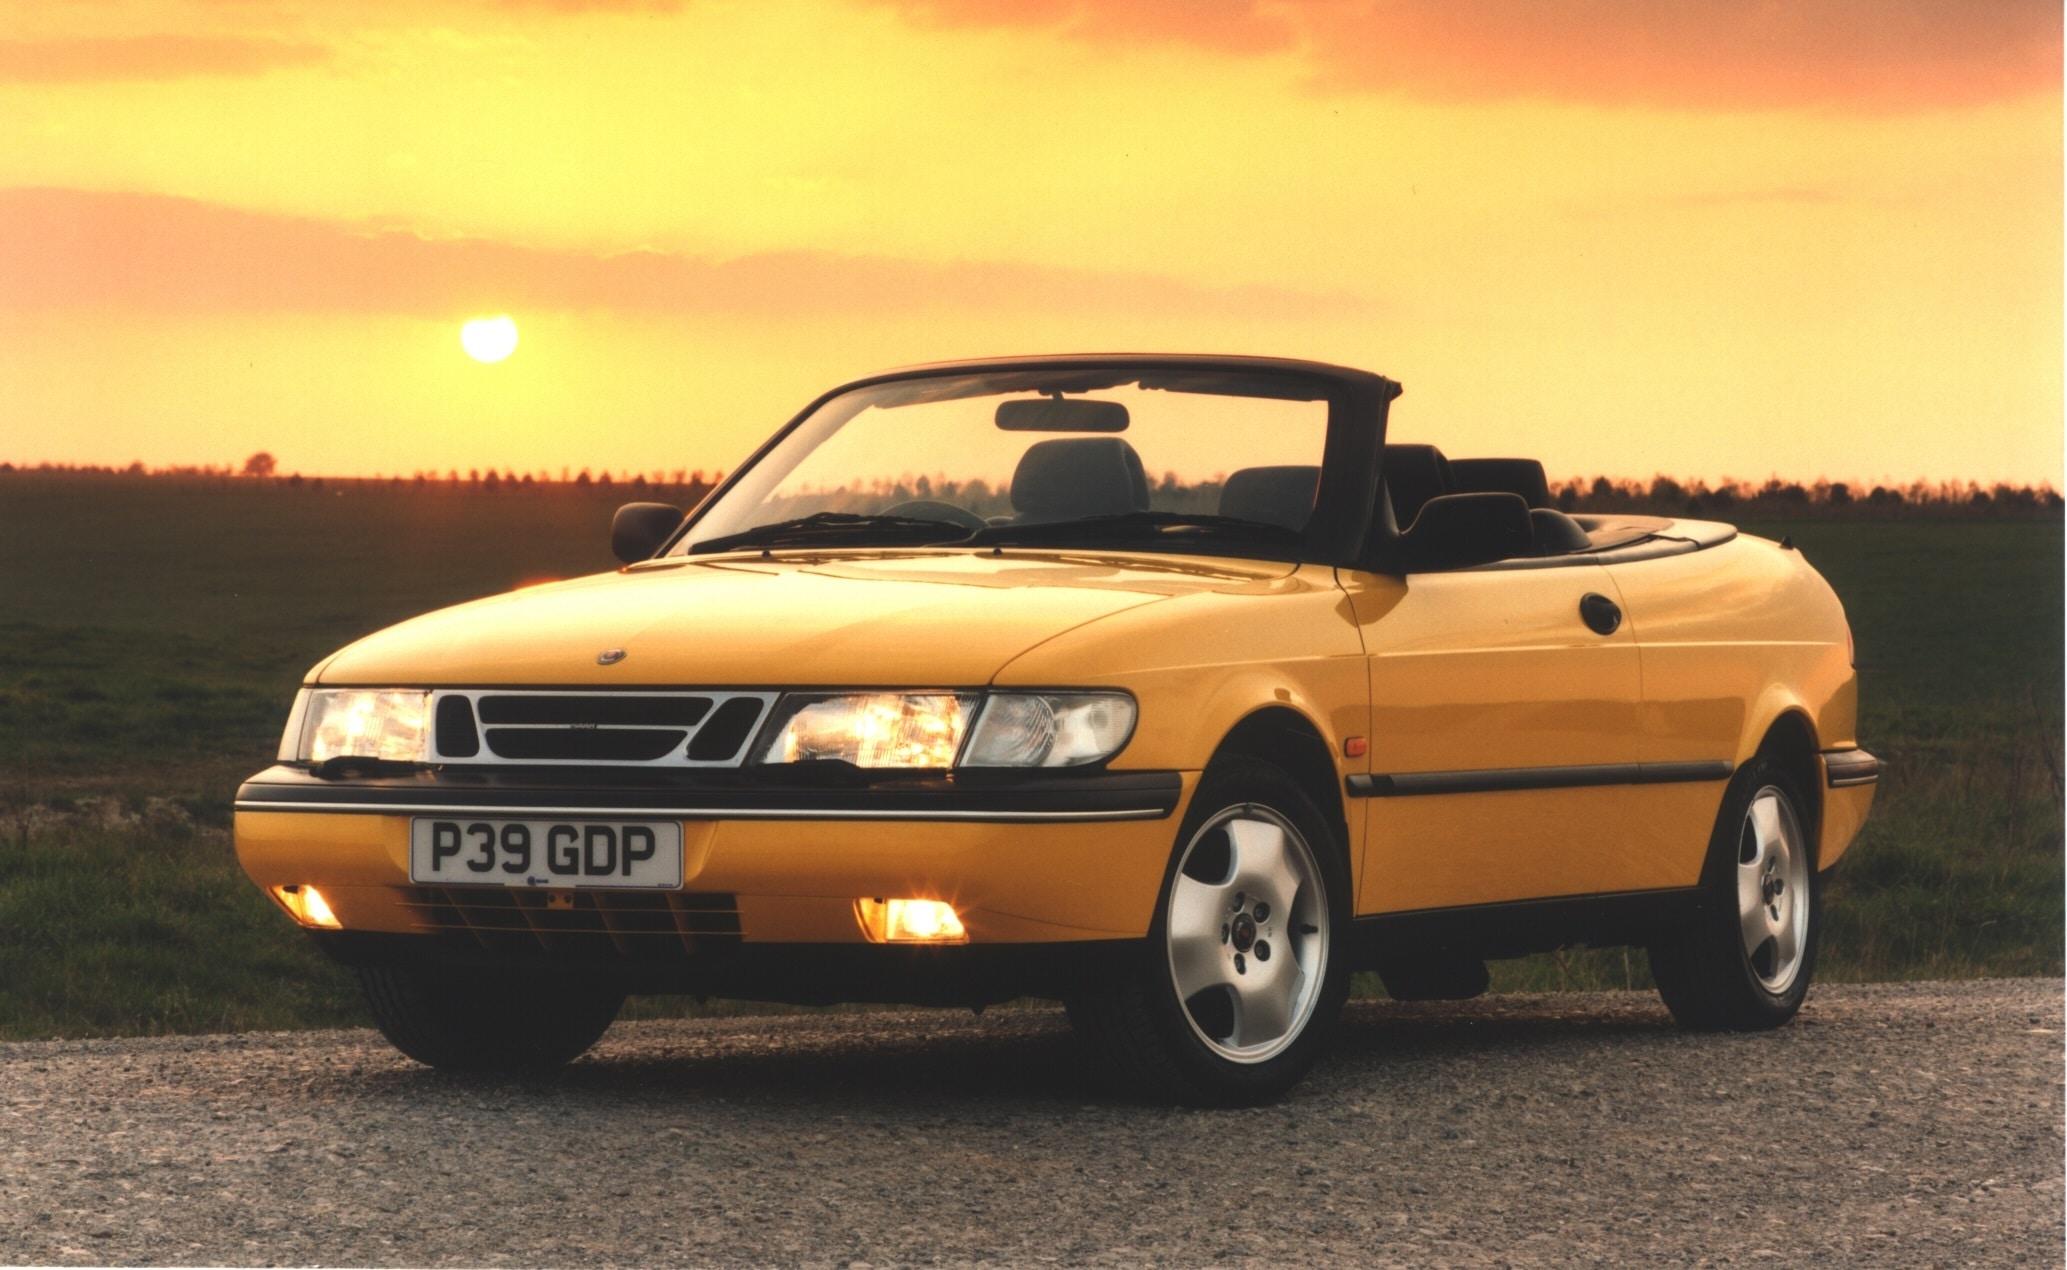 Saab, Saab 9-5, Saab 9-3, 9-3, 9-5, cars, car, Sweden, motoring, automotive, classic car, retro car, old car, turbo, estate, touring, ebay motors, autotrader, motoring, automotive